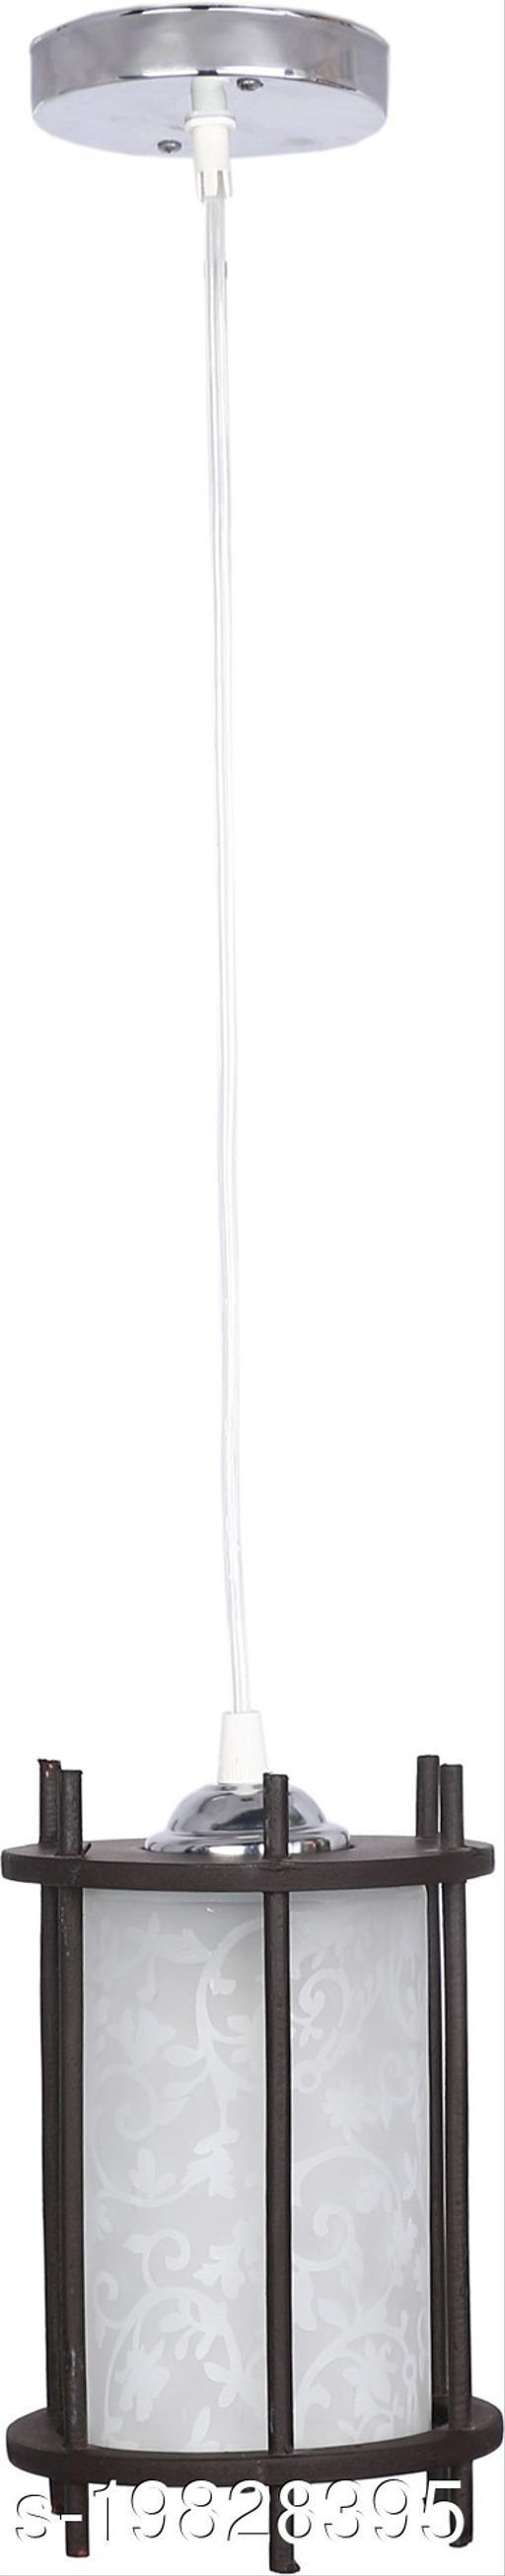 Afast Designer Pendant Hanging Ceiling Lamp Light With Designer Wooden Box & All Fitting -Wd25